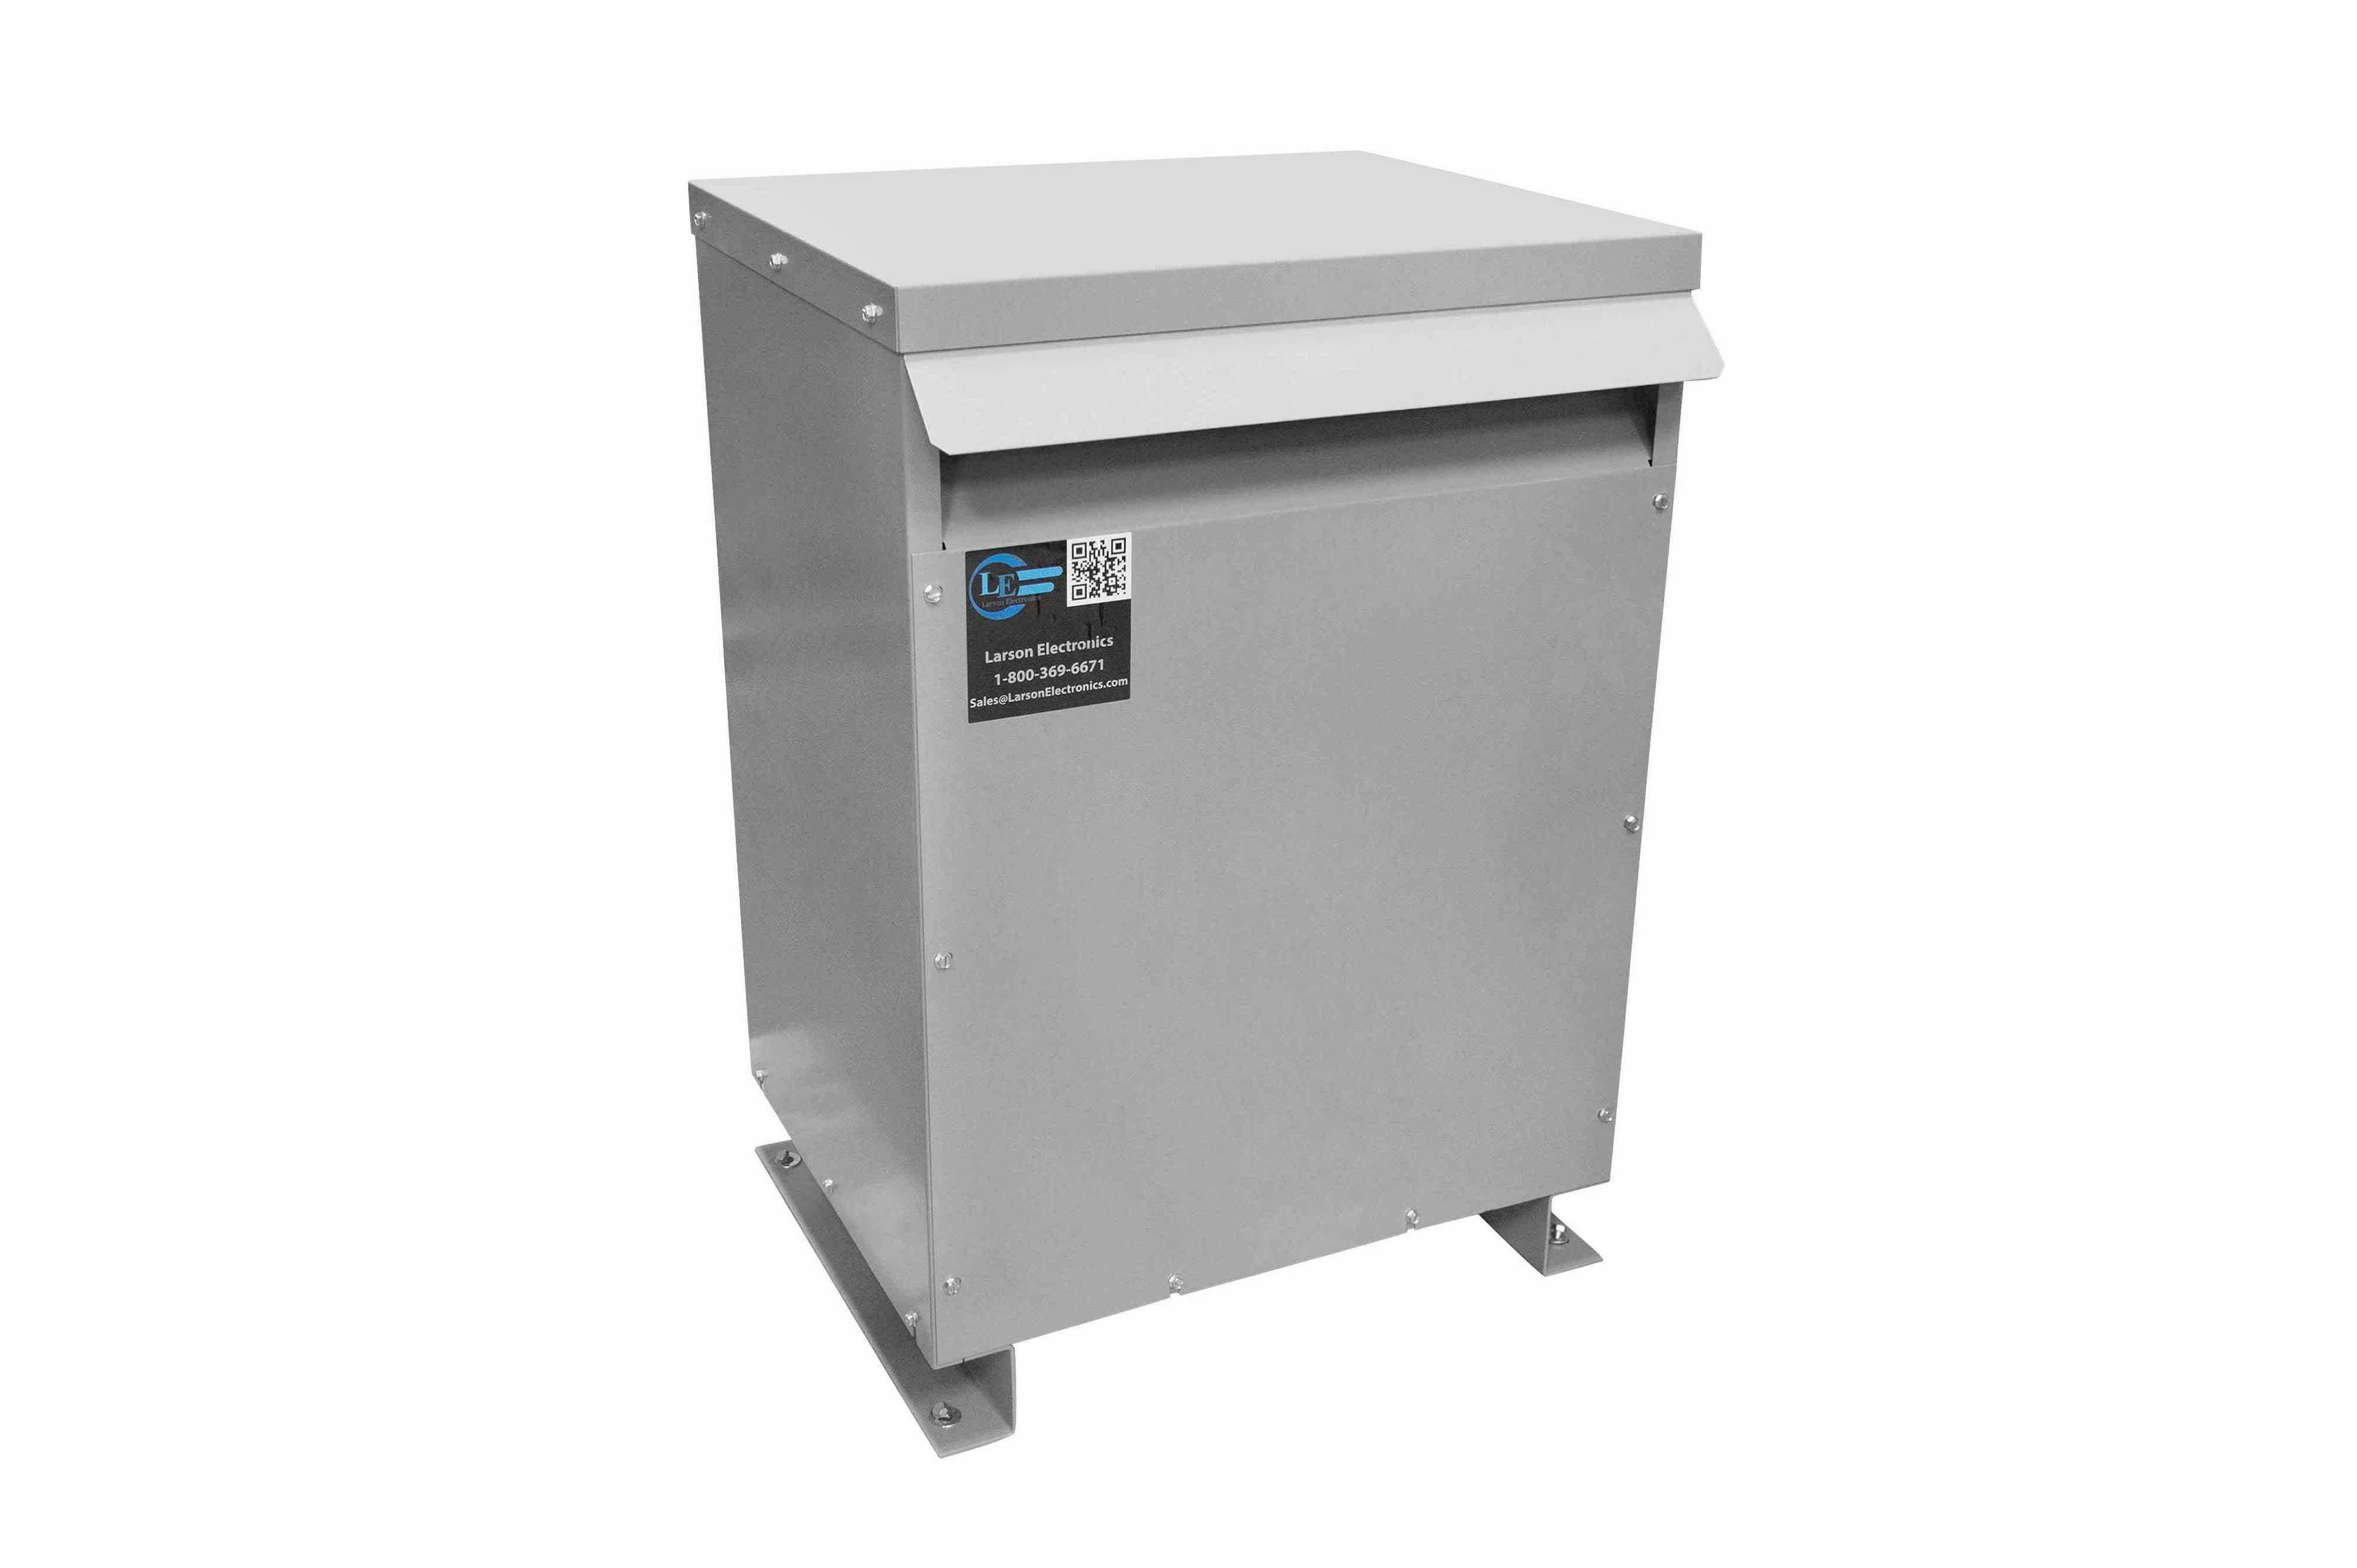 175 kVA 3PH Isolation Transformer, 220V Wye Primary, 208V Delta Secondary, N3R, Ventilated, 60 Hz